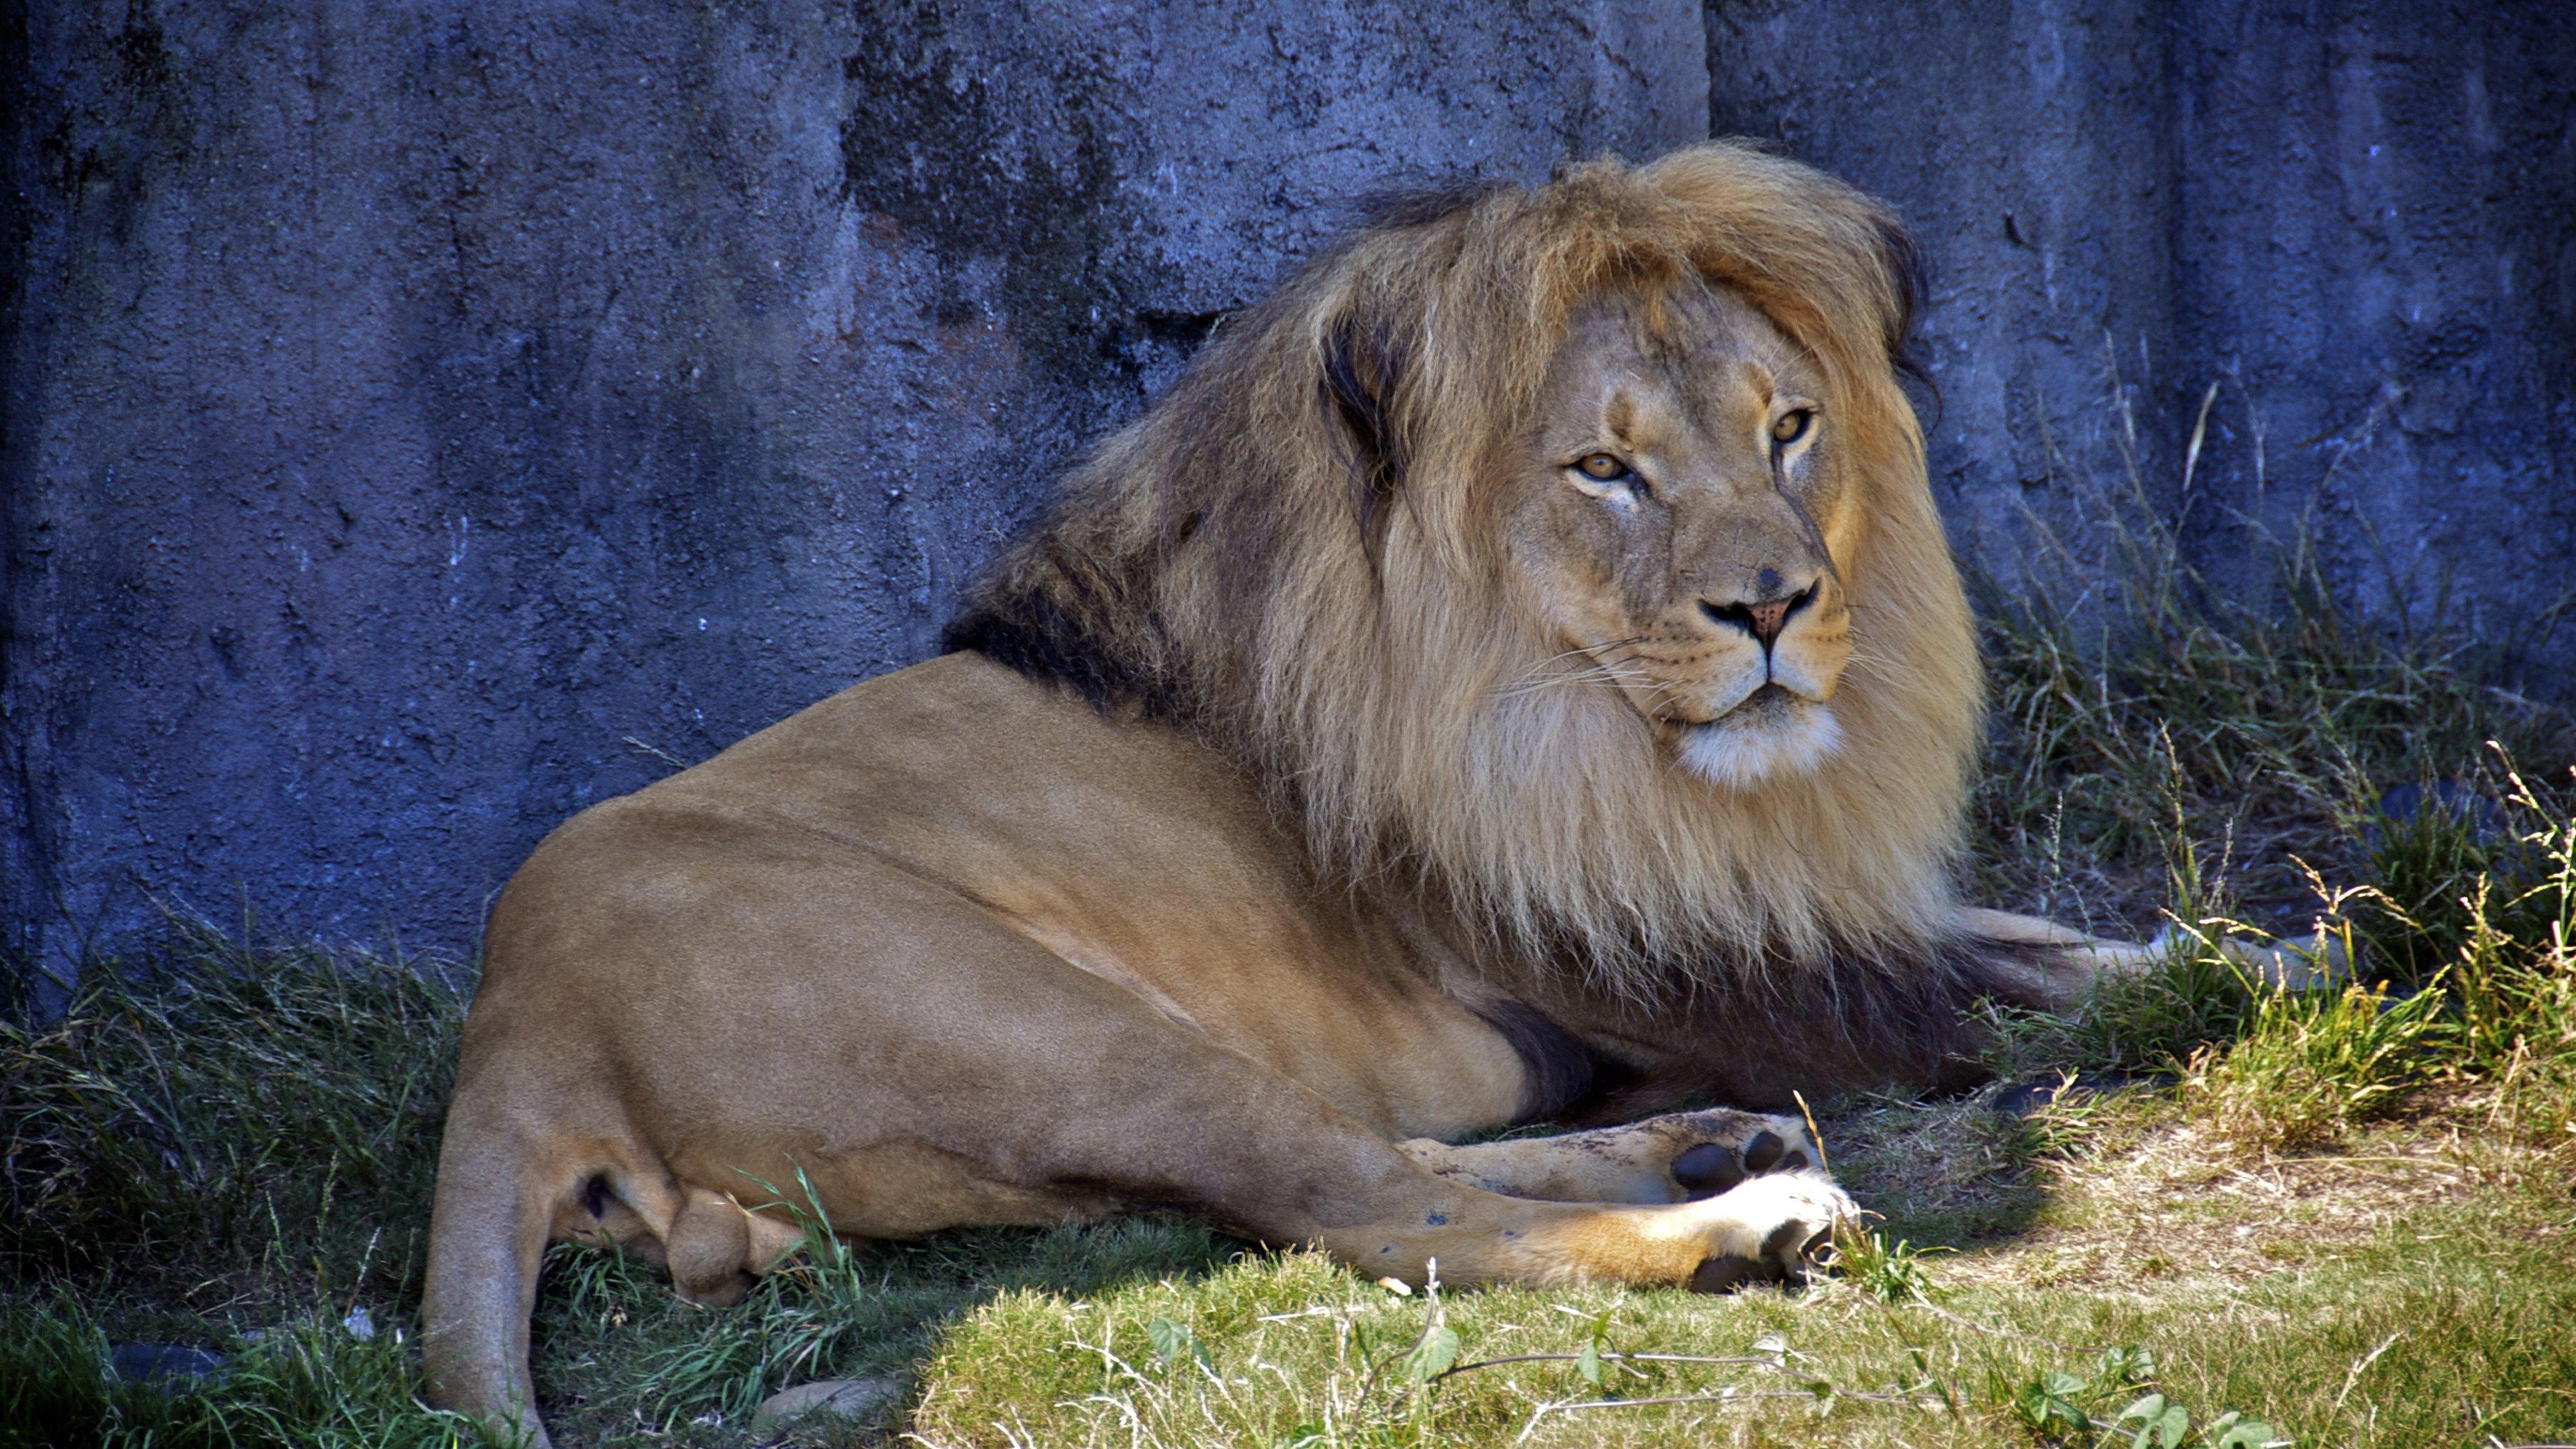 Male Lion Wallpaper Hd